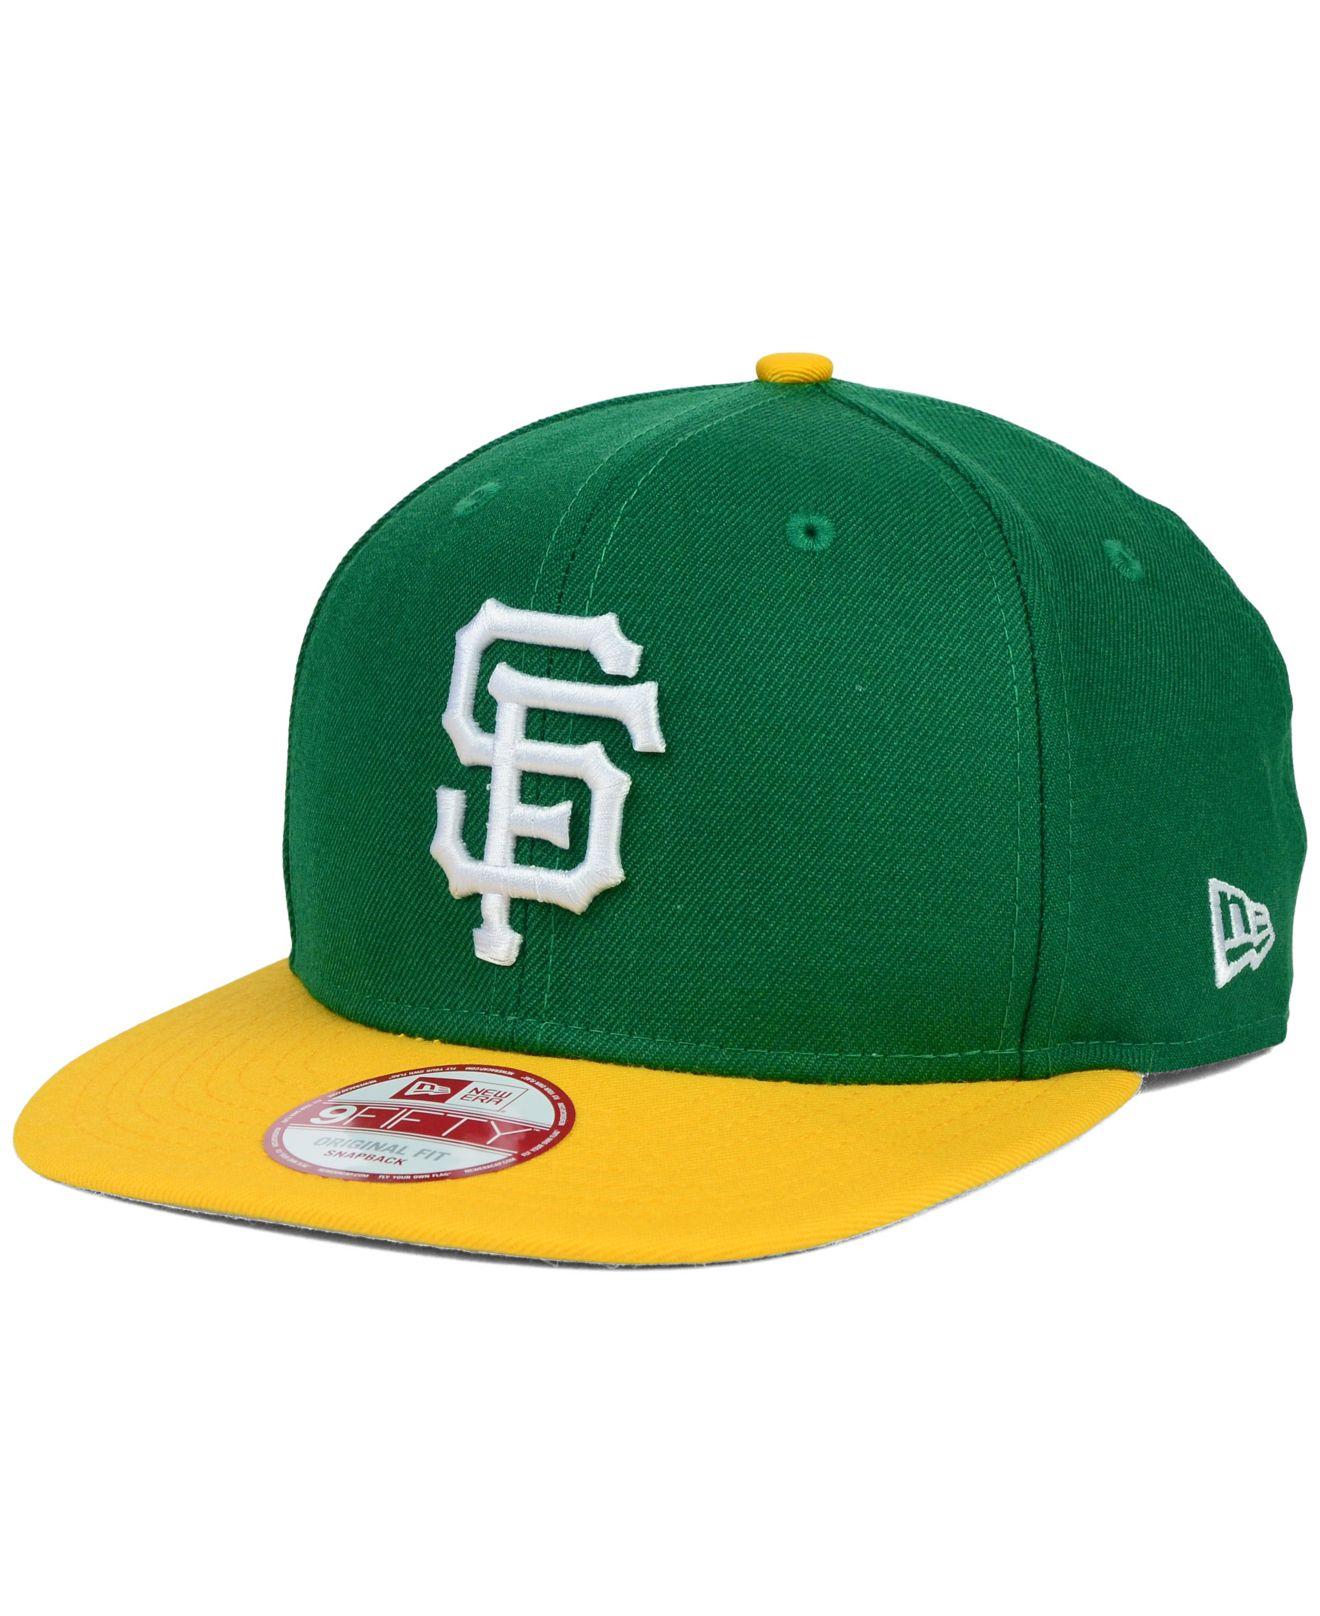 5856b6d1 coupon code for green san francisco giants hat 6de2d 55545